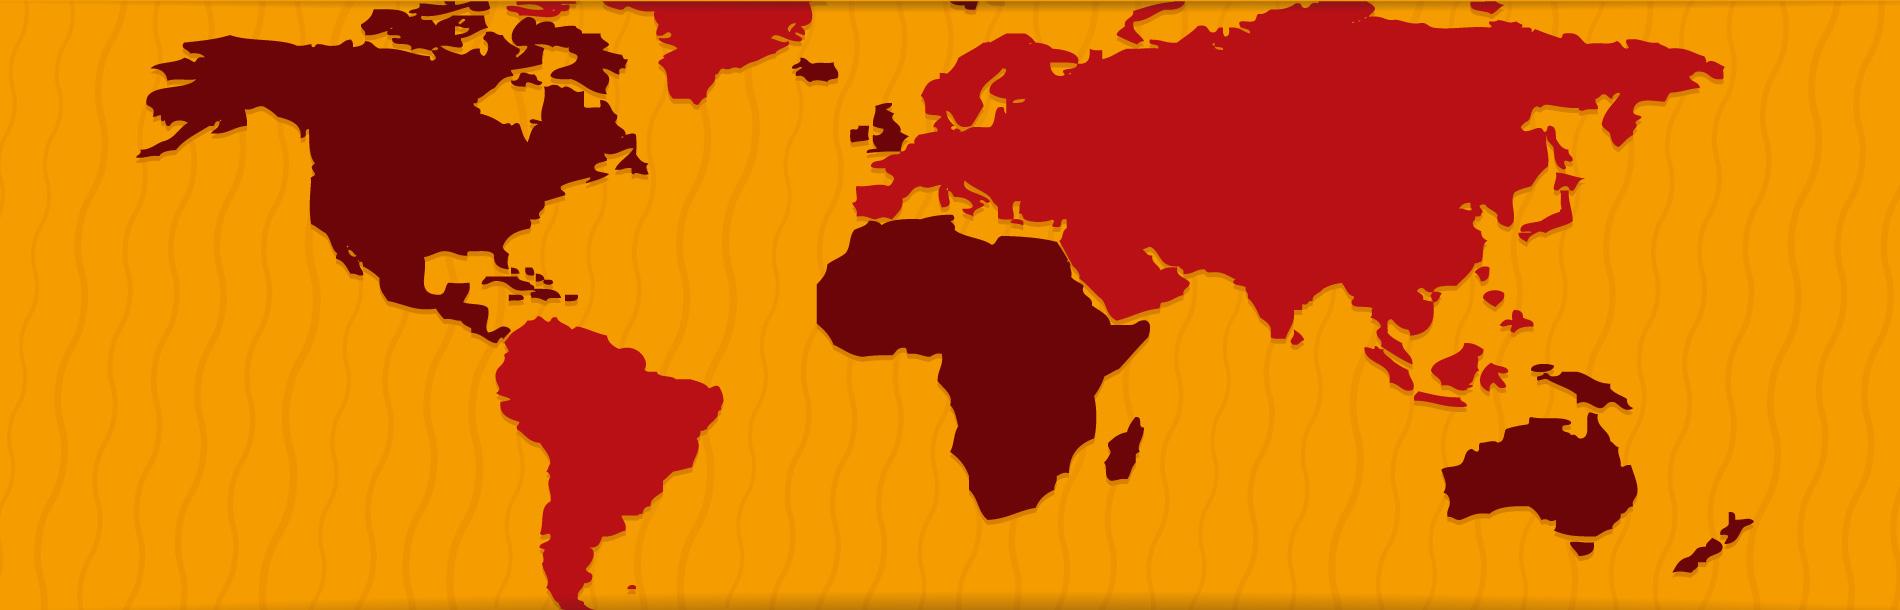 Circolombia Circus Travel Tour Worldwide Representations